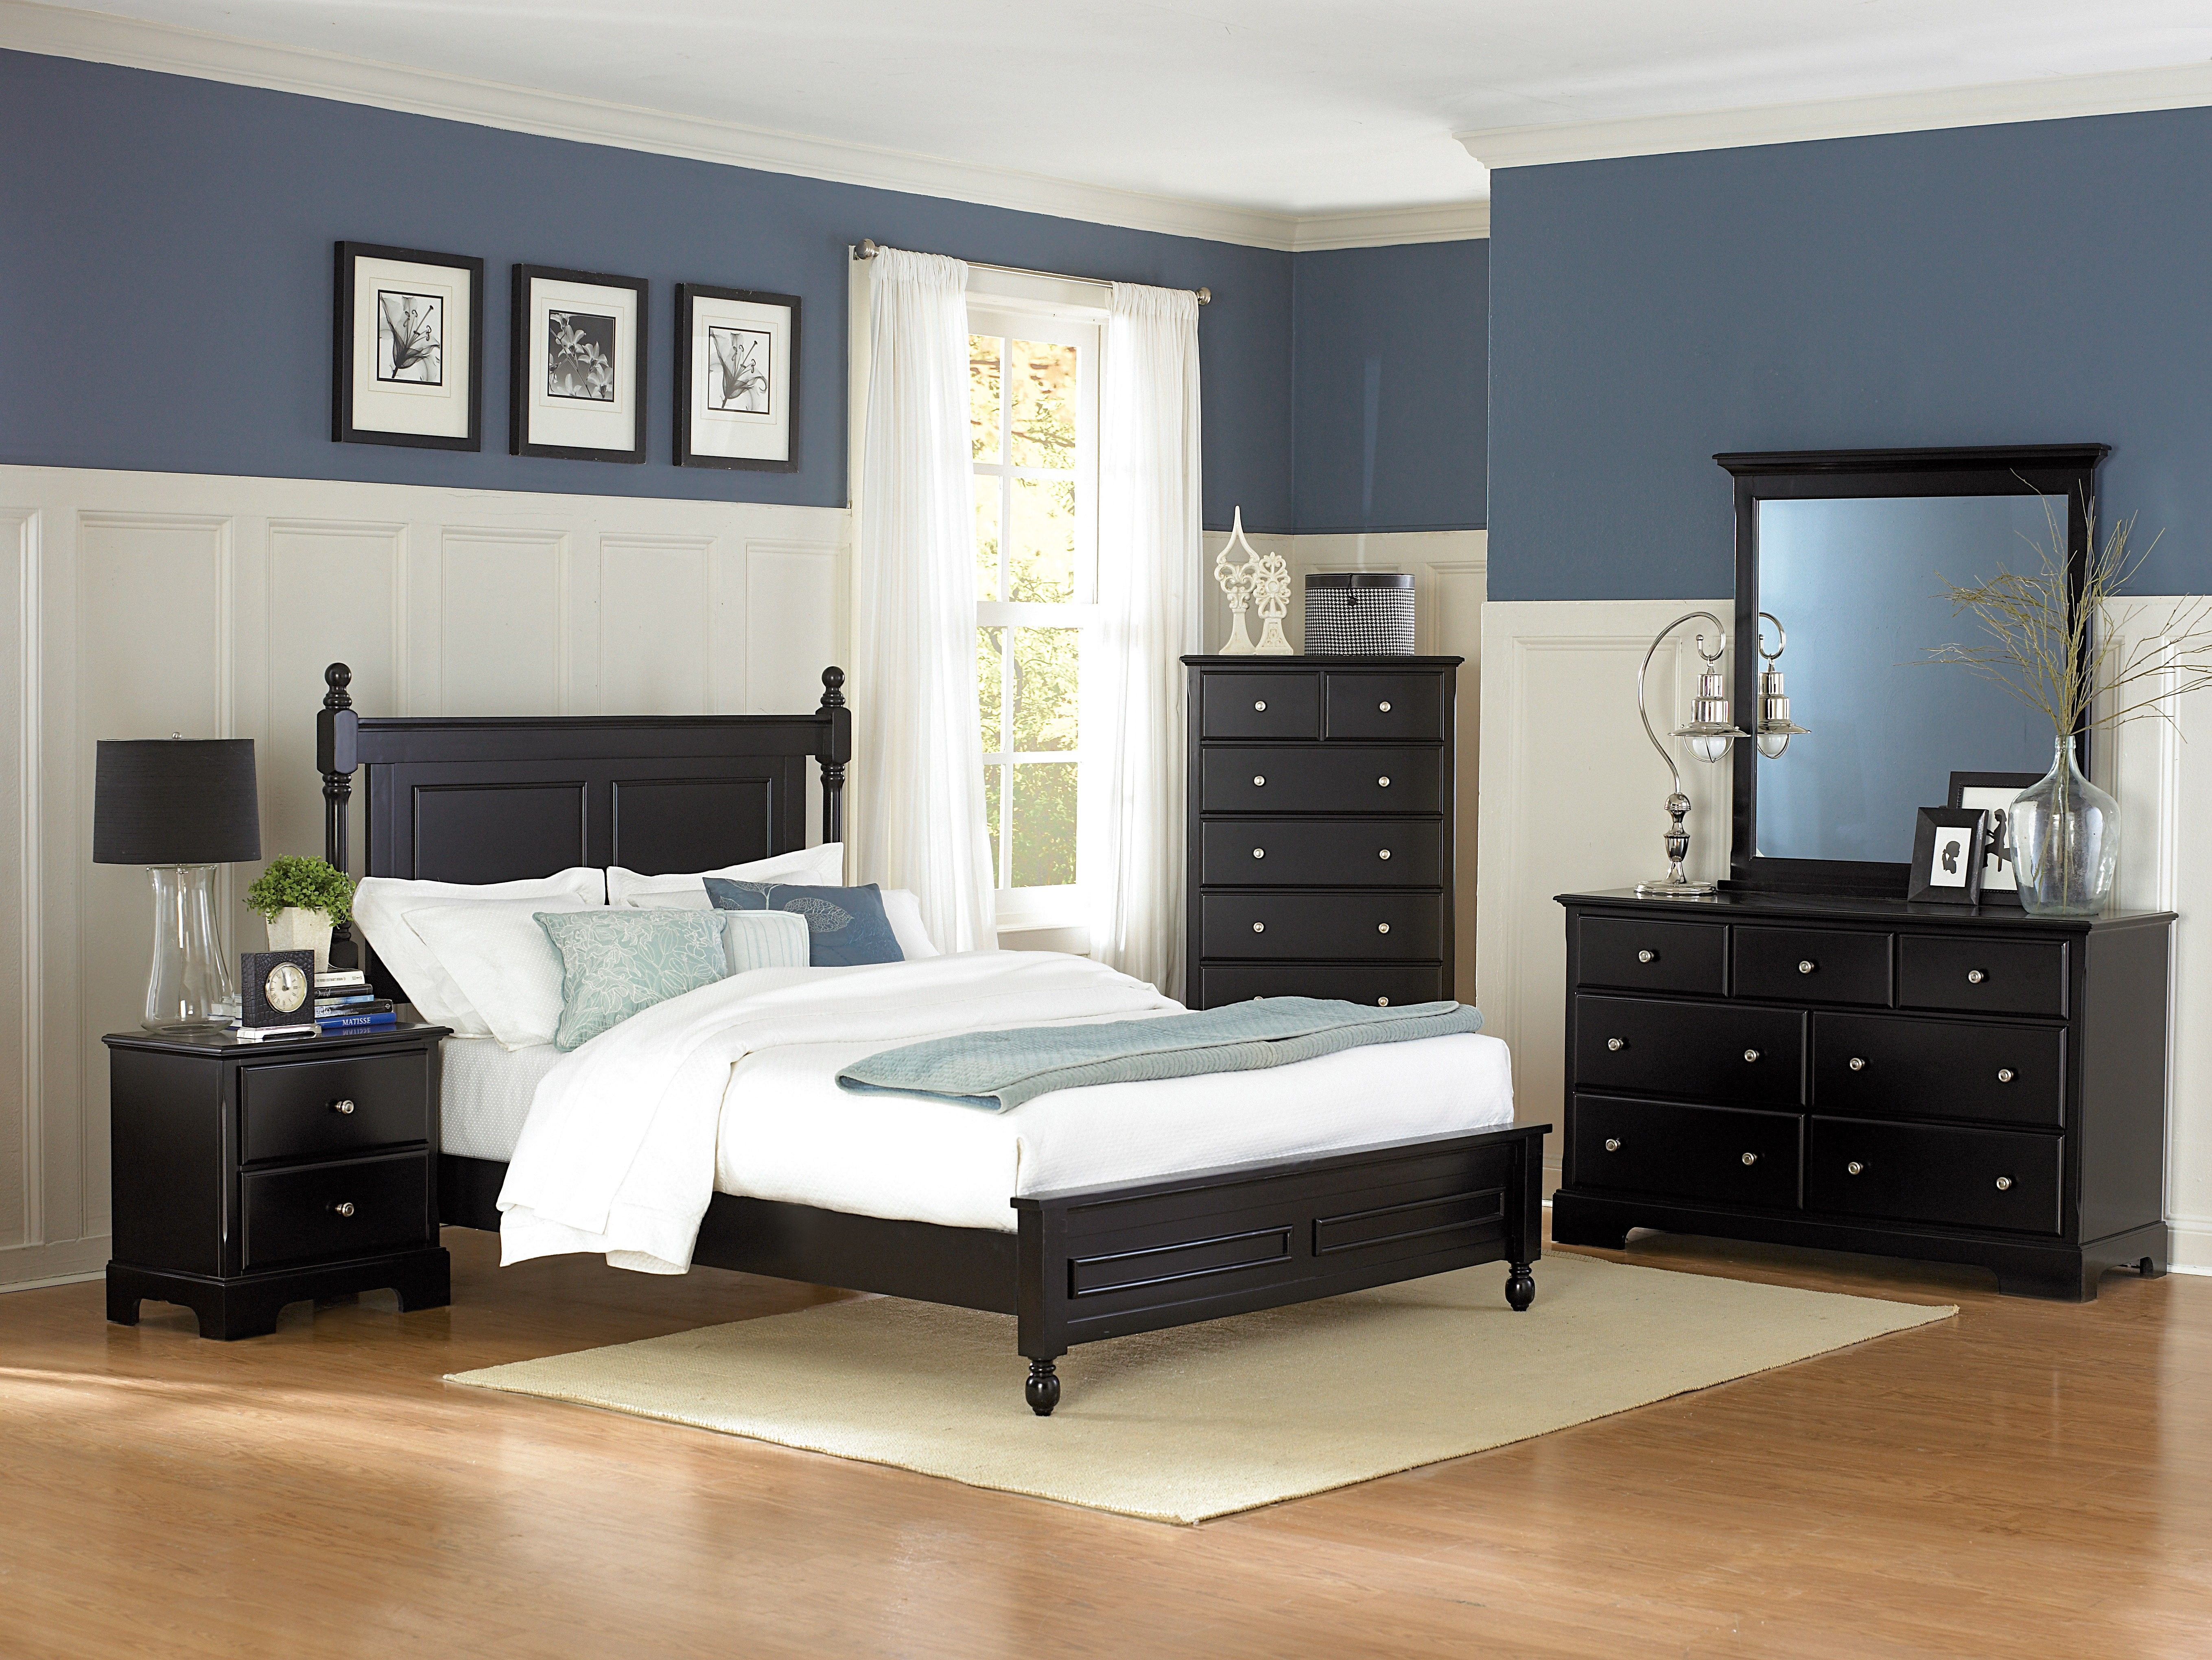 Morelle pc bedroom set black in kidus rooms pinterest